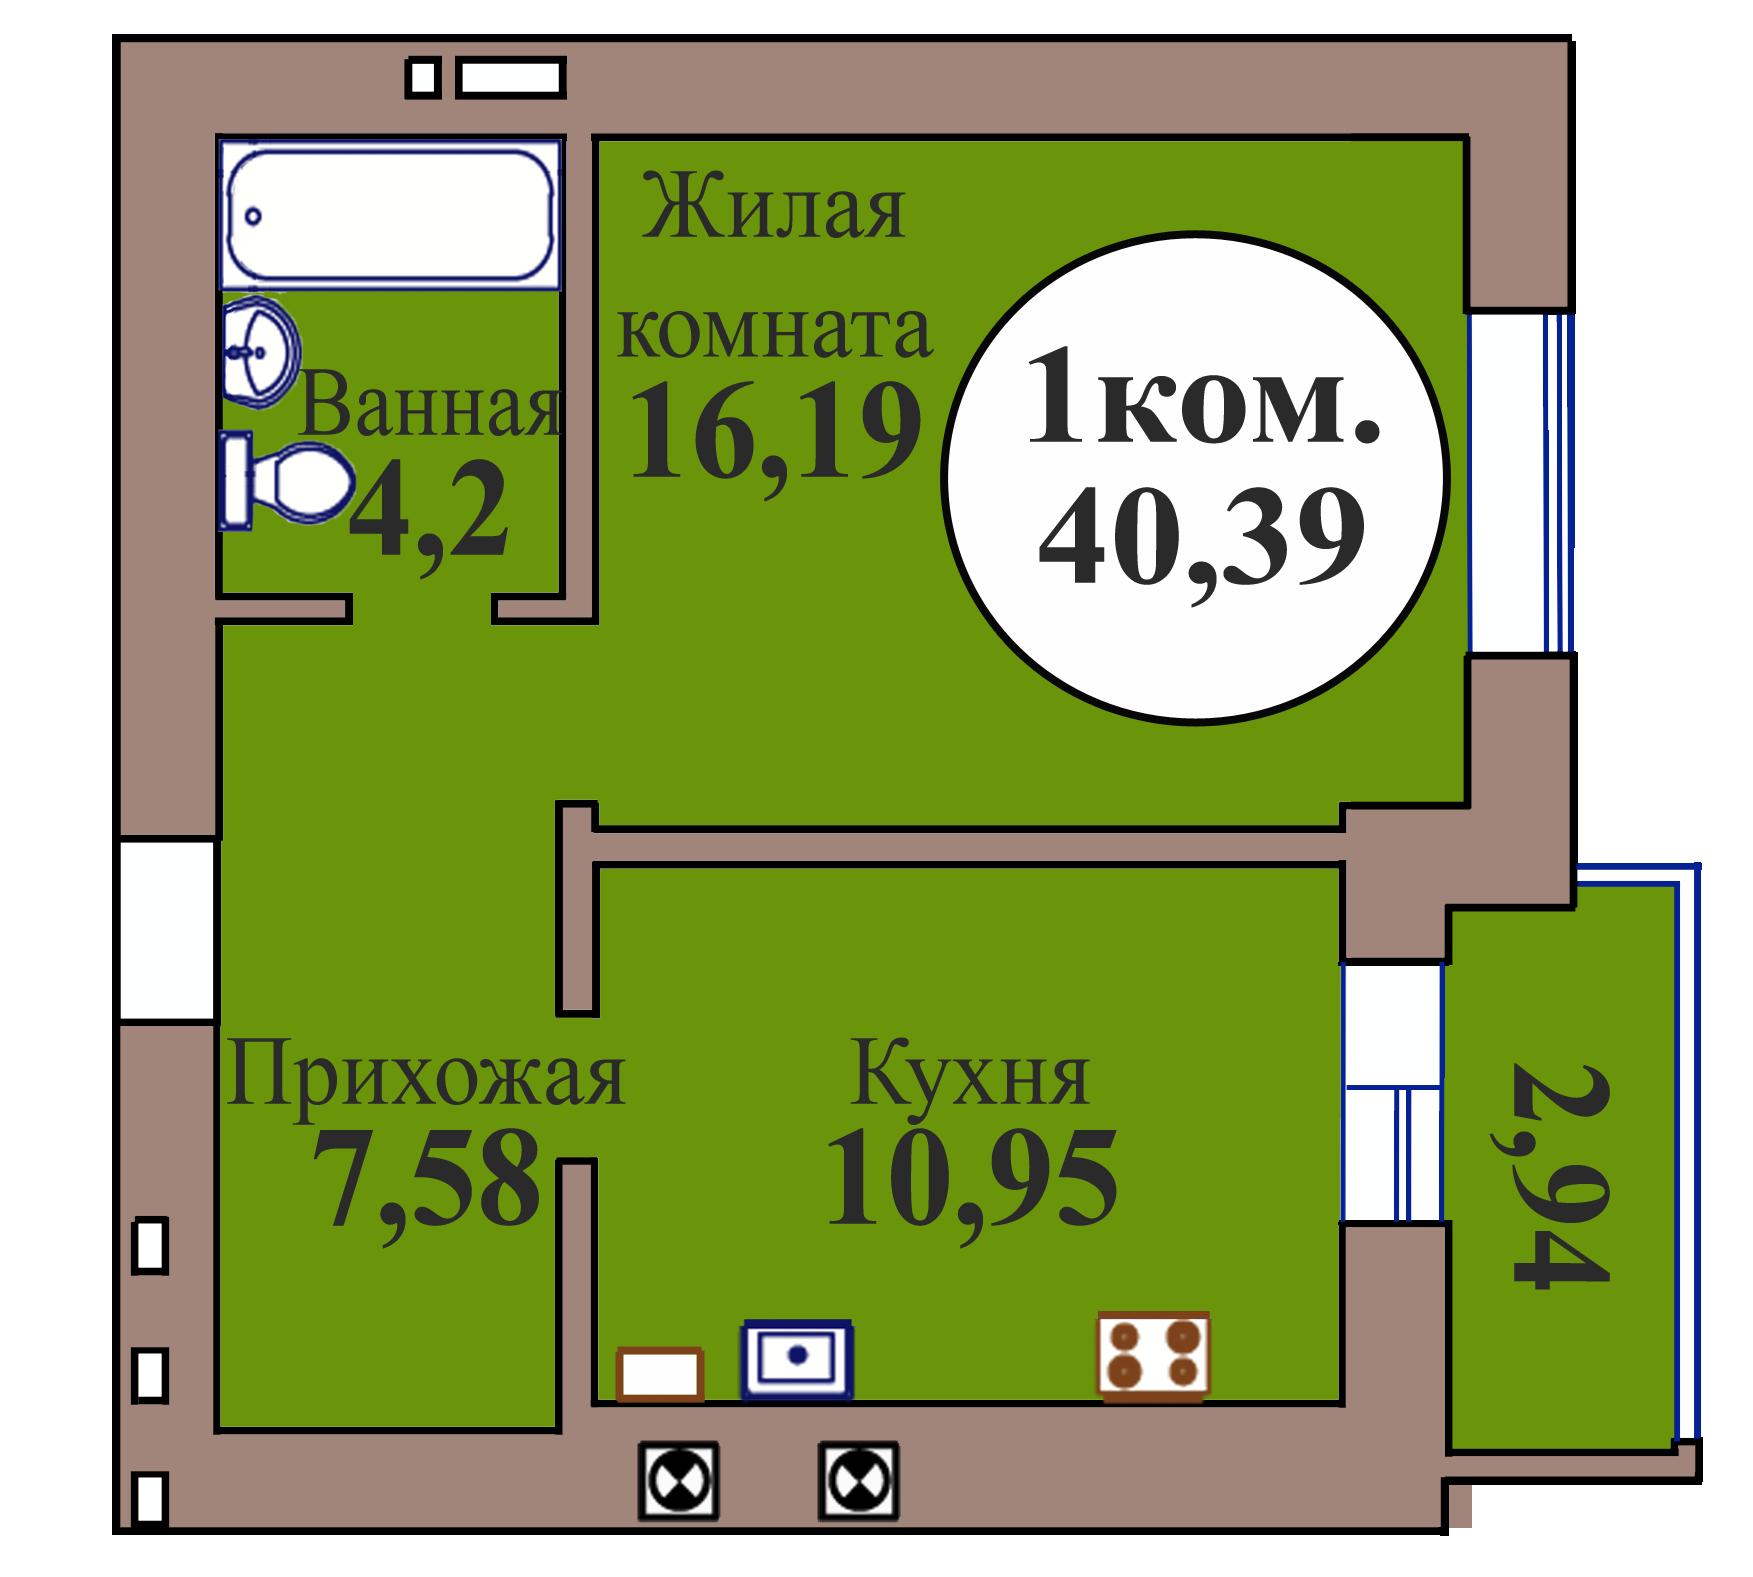 1-комн. кв. по пер. Калининградский, 5 кв. 111 в Калининграде